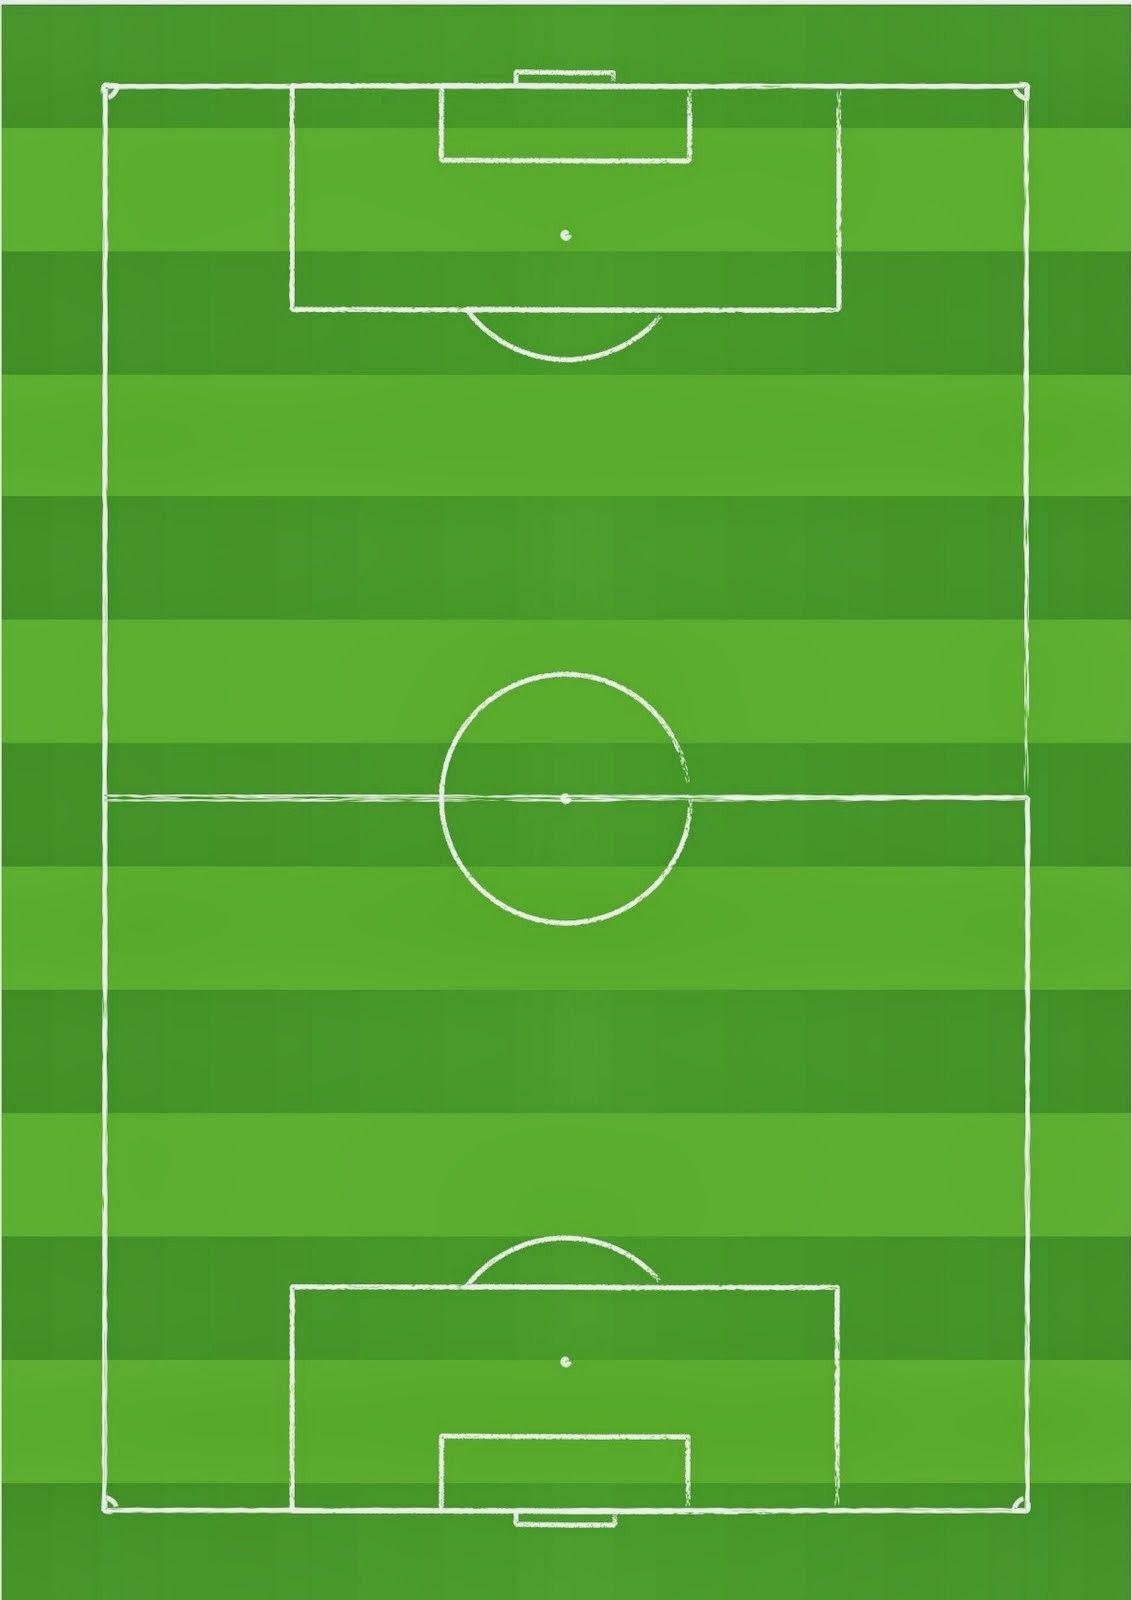 Kit para Fiestas de Futbol para Imprimir gratis  photocall